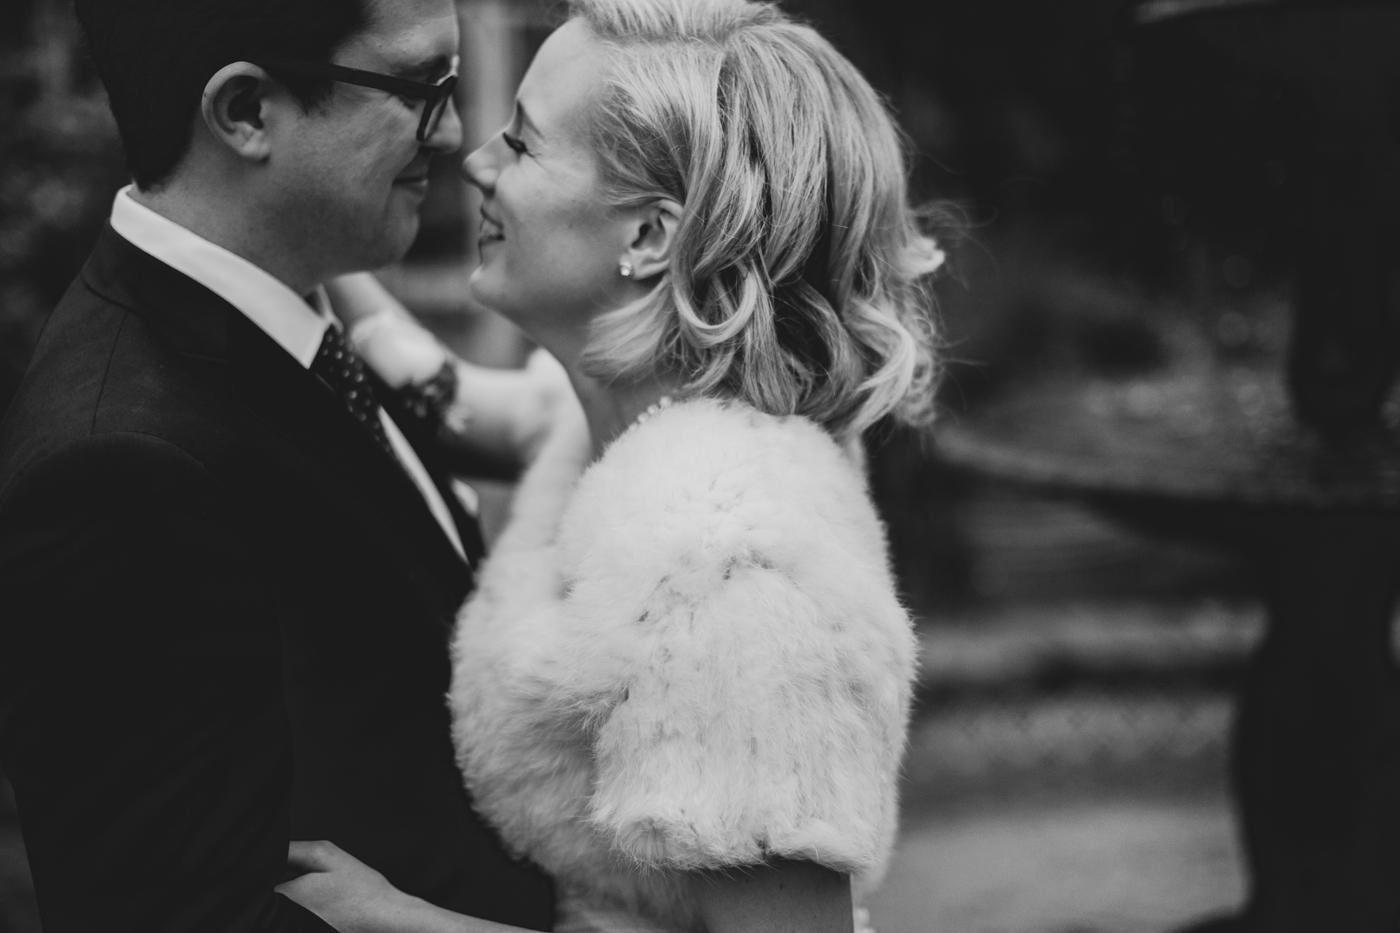 Jo & Tom Wedding - The Grounds of Alexandria - Samantha Heather Photography-226.jpg